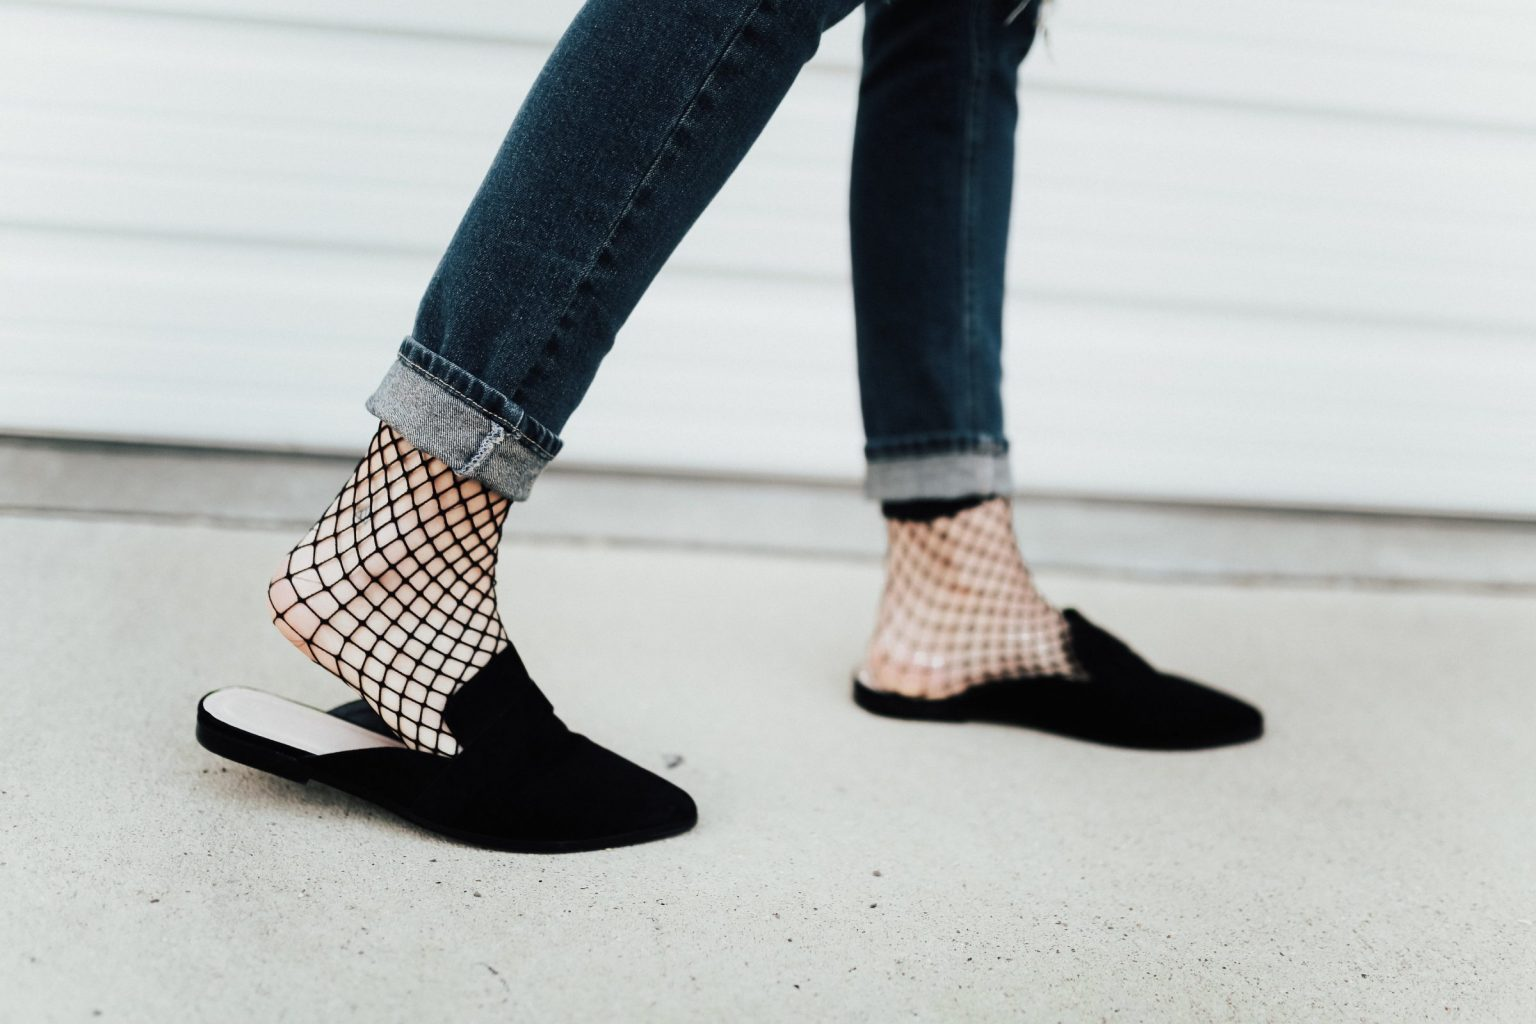 49c42a4ee8 Παπούτσια που θα Κάνουν Θραύση το 2018! - Eli.gr